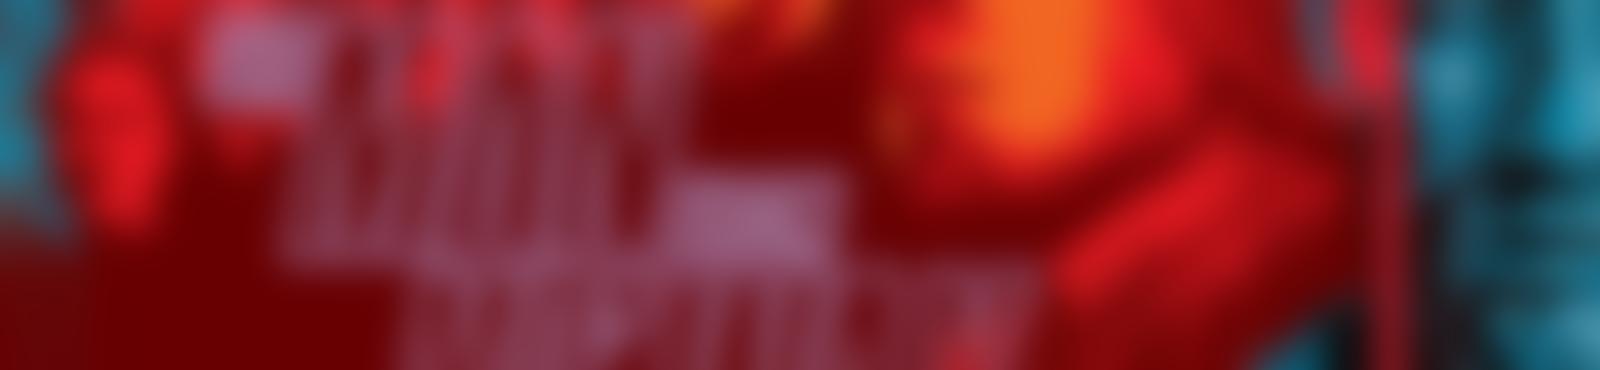 Blurred a76158f8 14a8 4704 aa05 725785c5b310